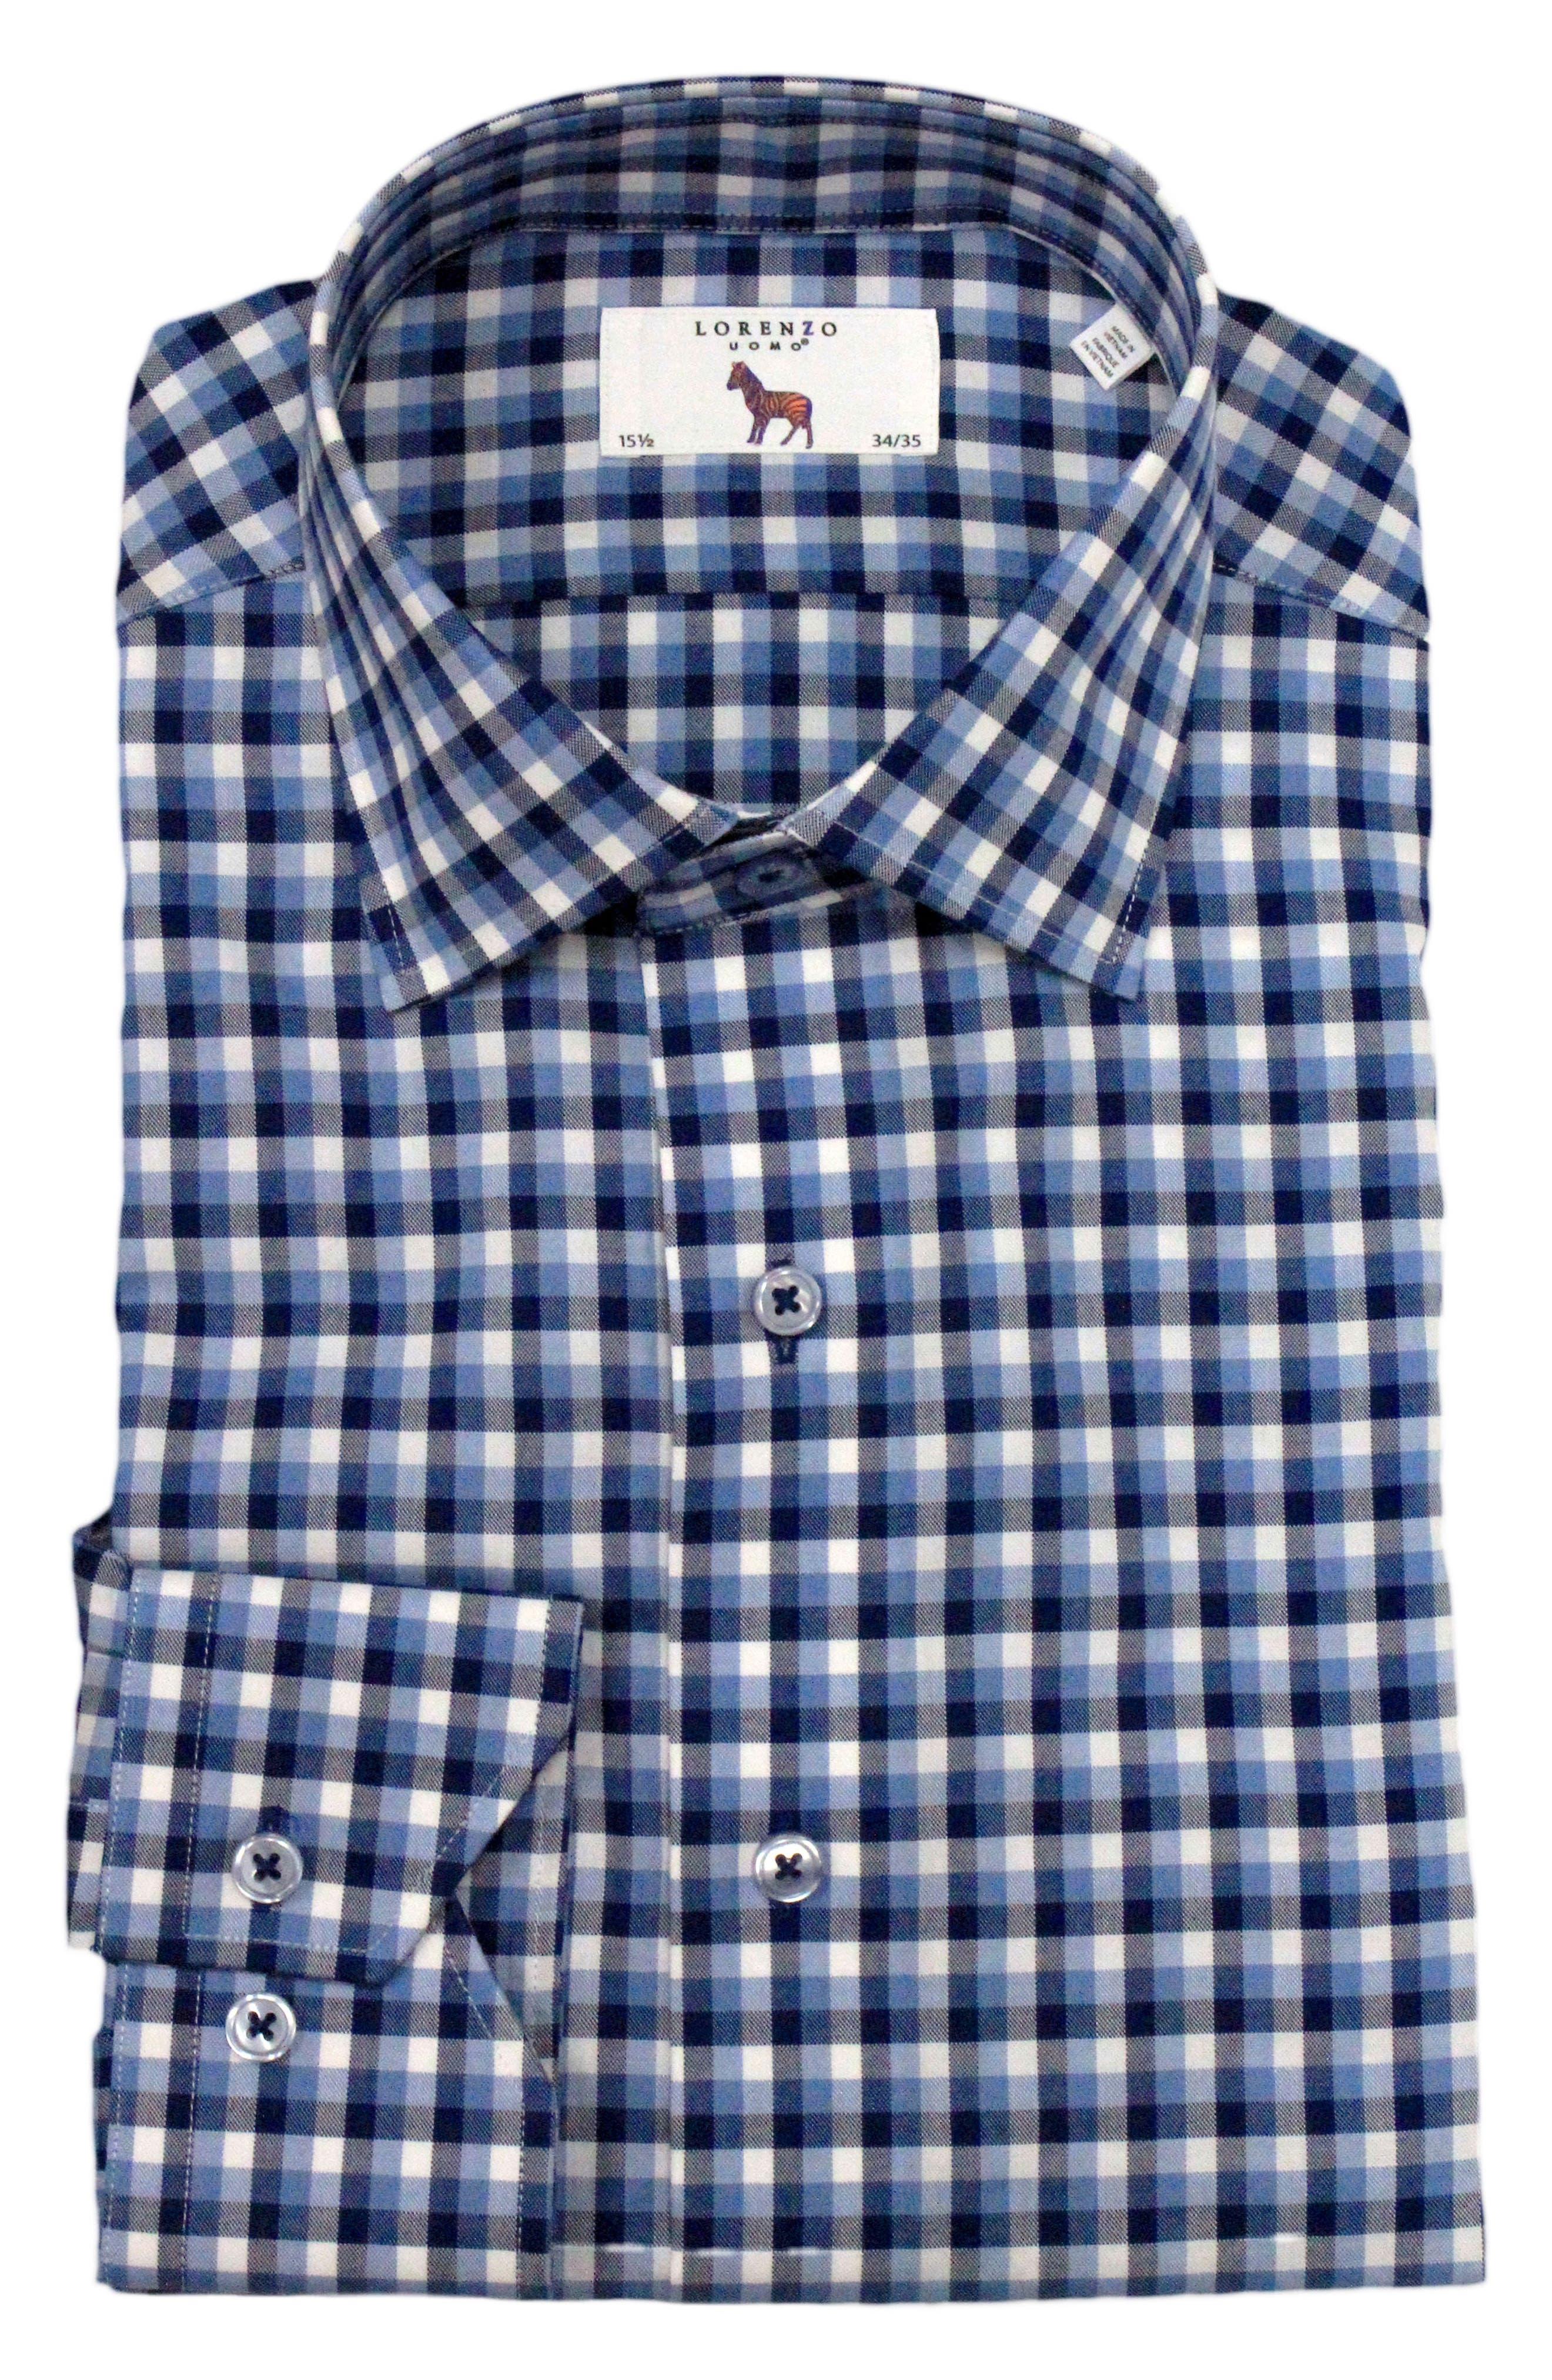 Alternate Image 1 Selected - Lorenzo Uomo Trim Fit Check Dress Shirt